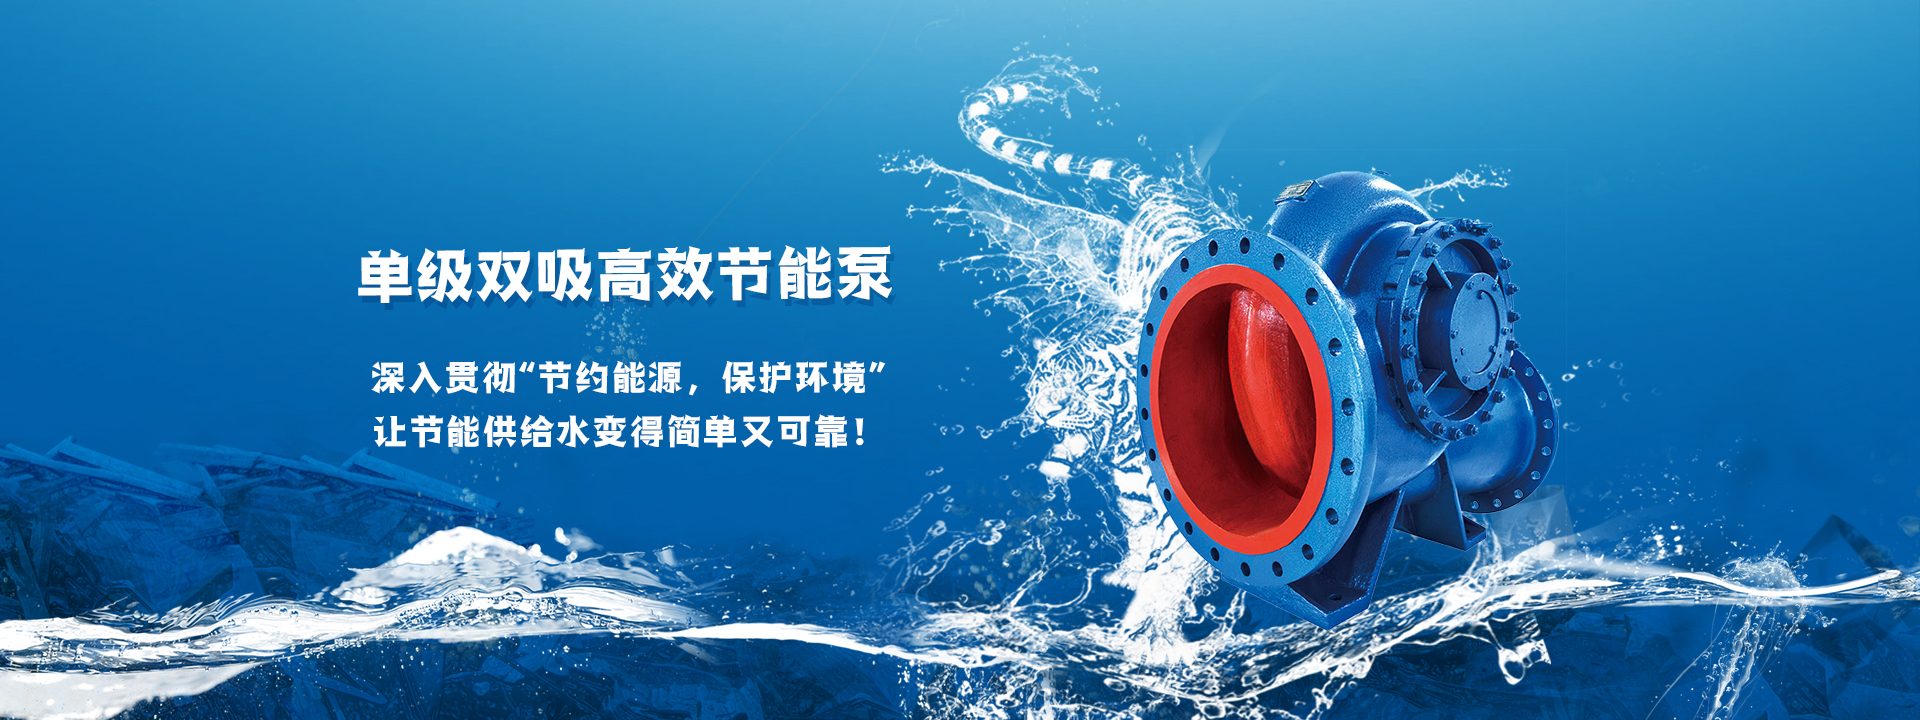 循环水泵节能改造banner